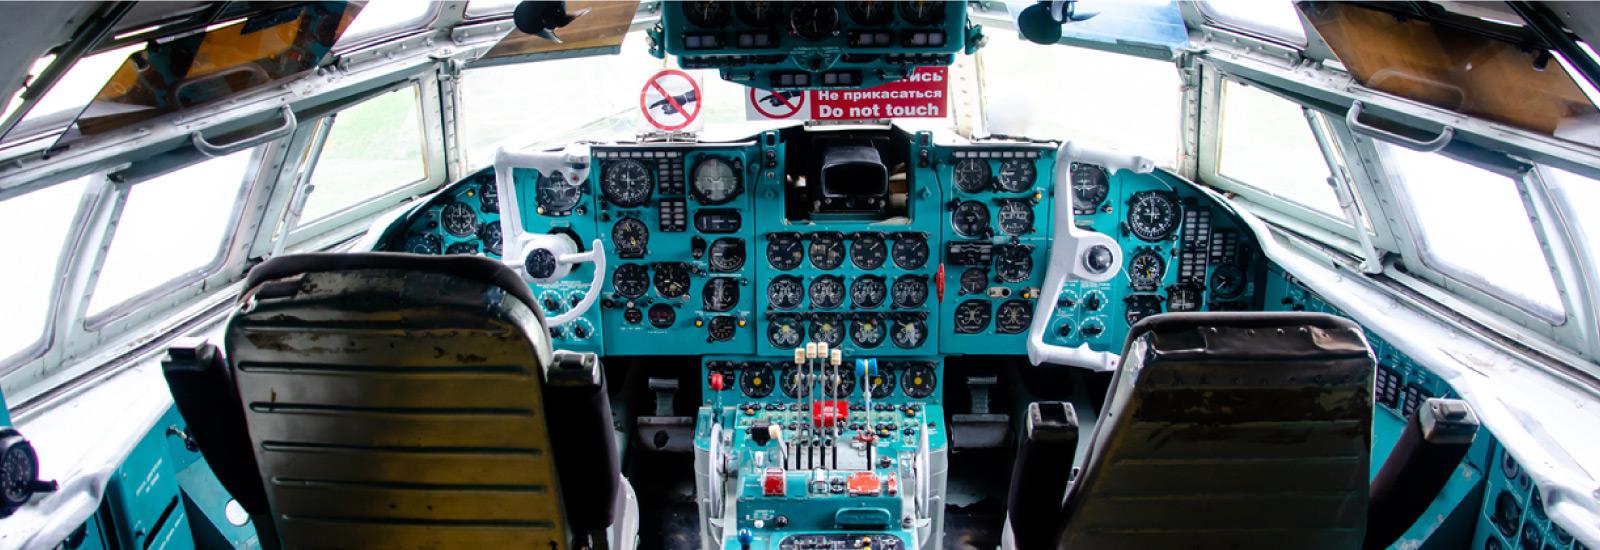 Future of Flight Aviation Center & Boeing Tour, Mukilteo, WA